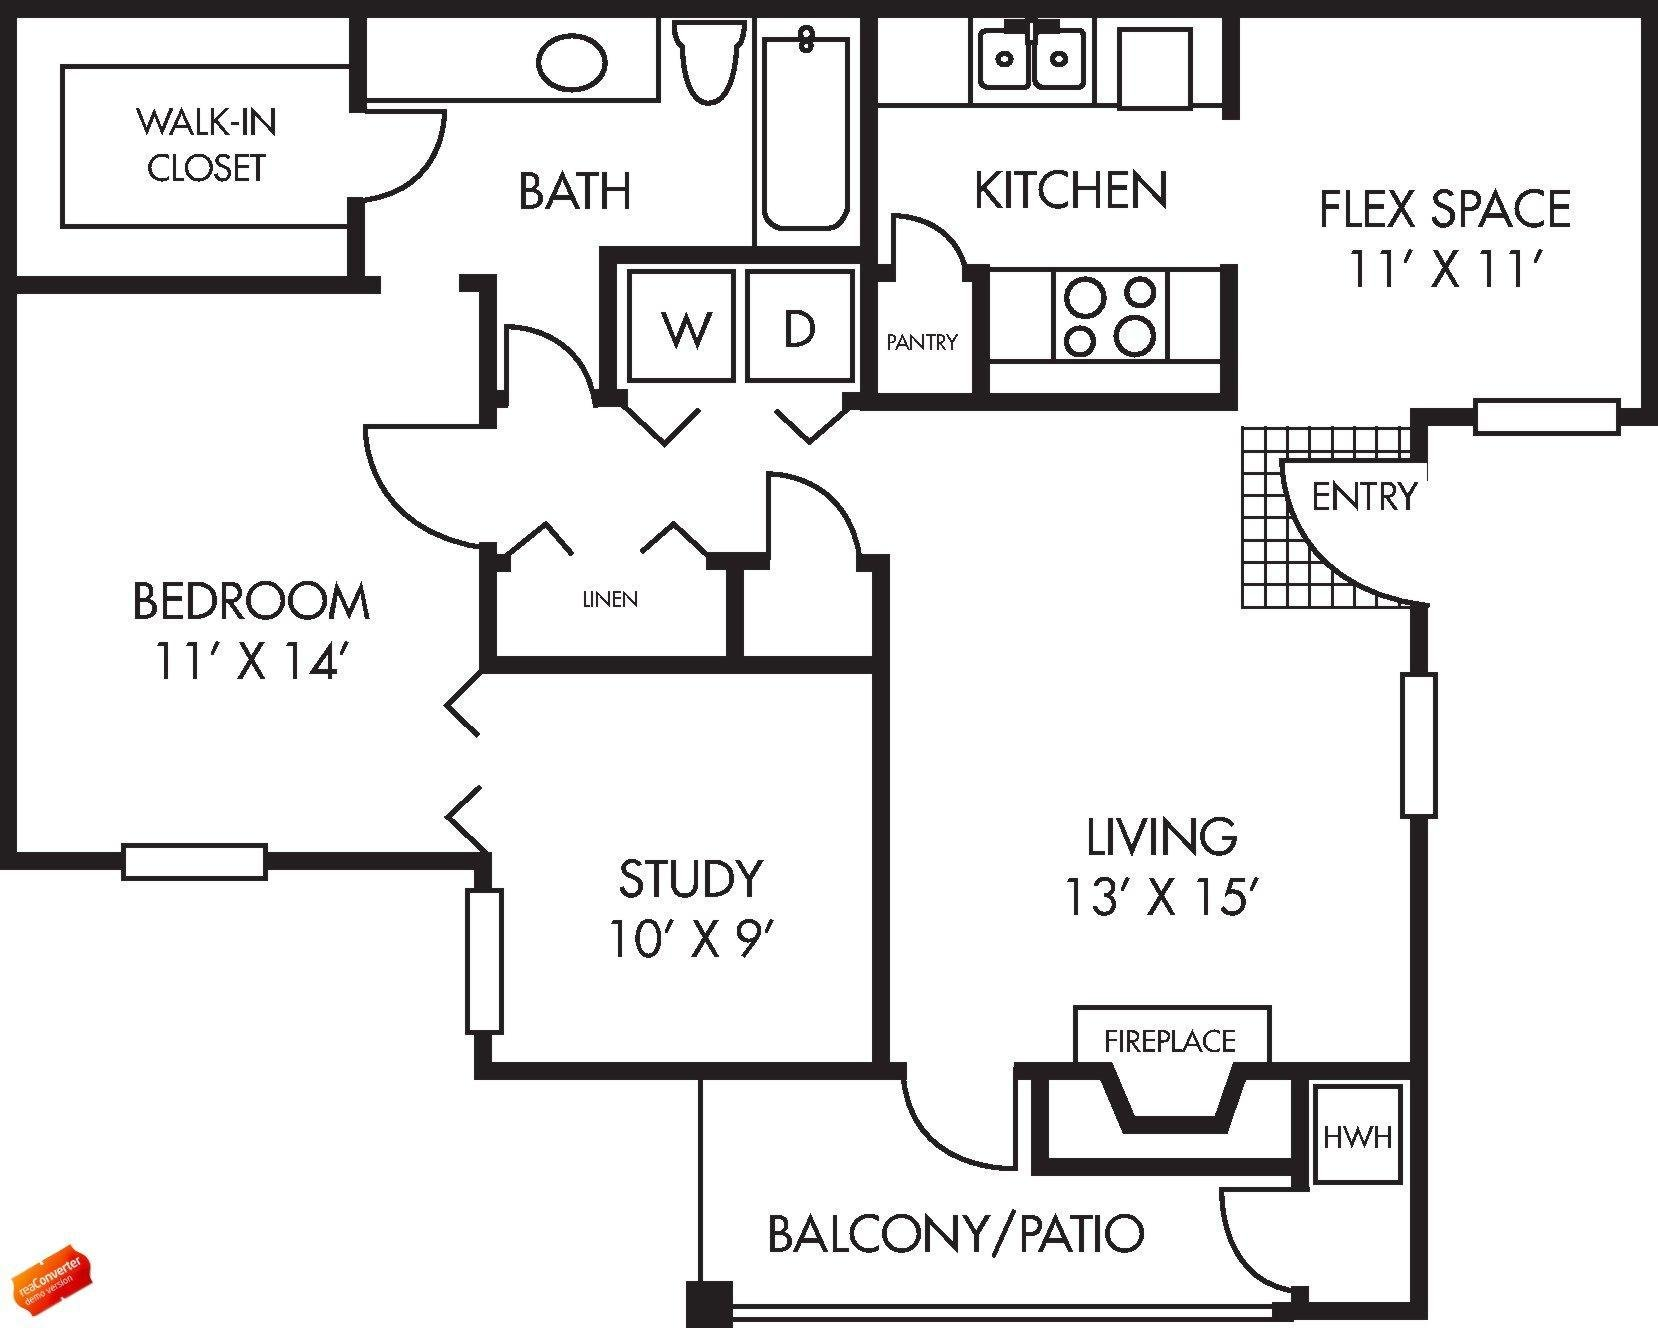 Augusta Floor Plan 1 bed 1 bath 1 study 876 square feet with Balcony / Patio - Houston Apartment